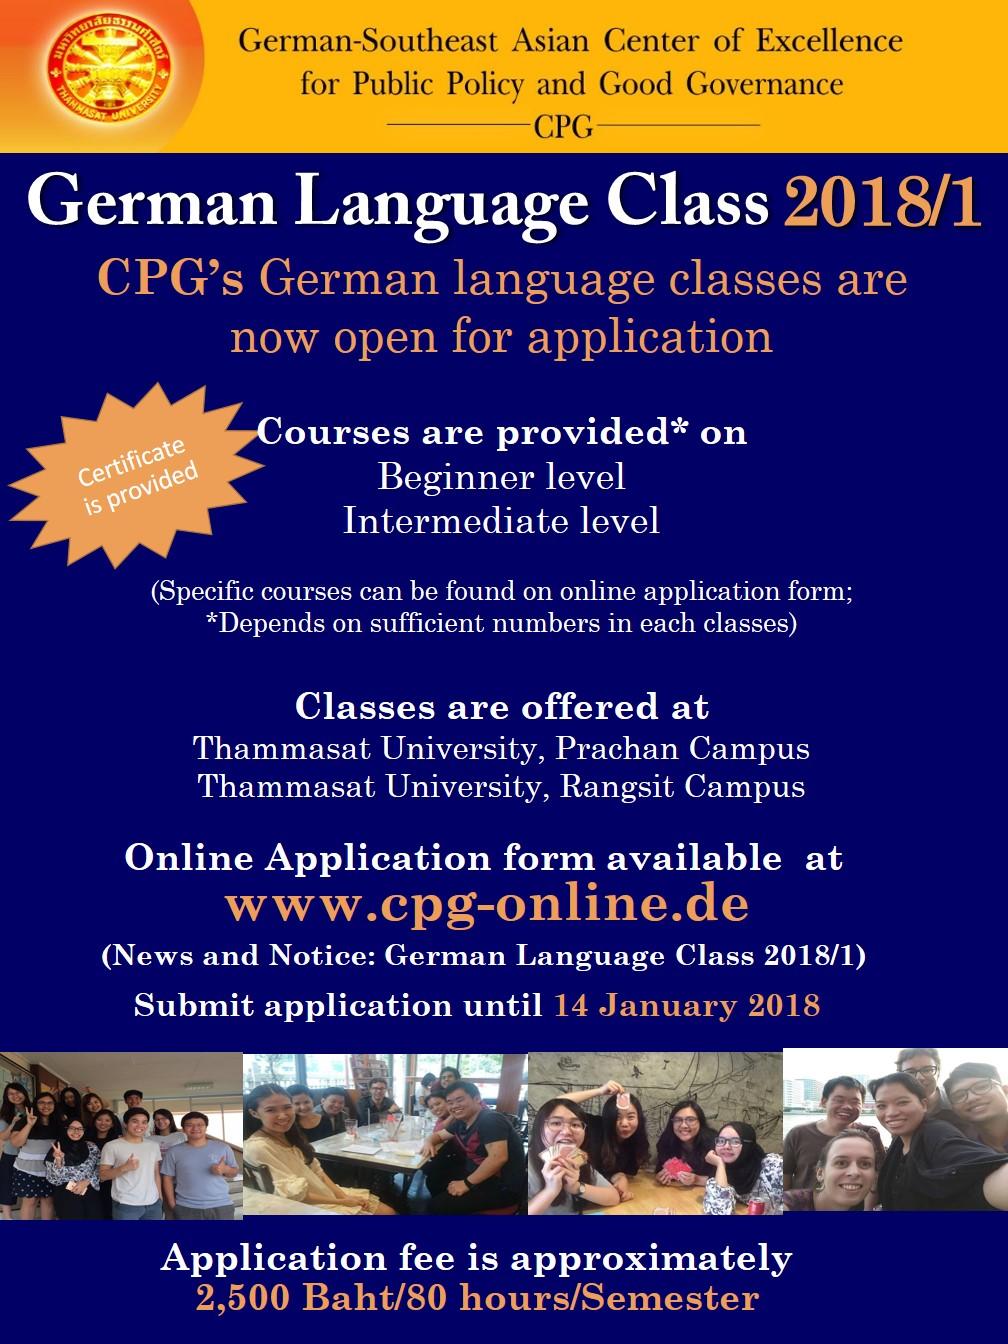 Cpg German Language Classes 2018 German Southeast Asian Center Of